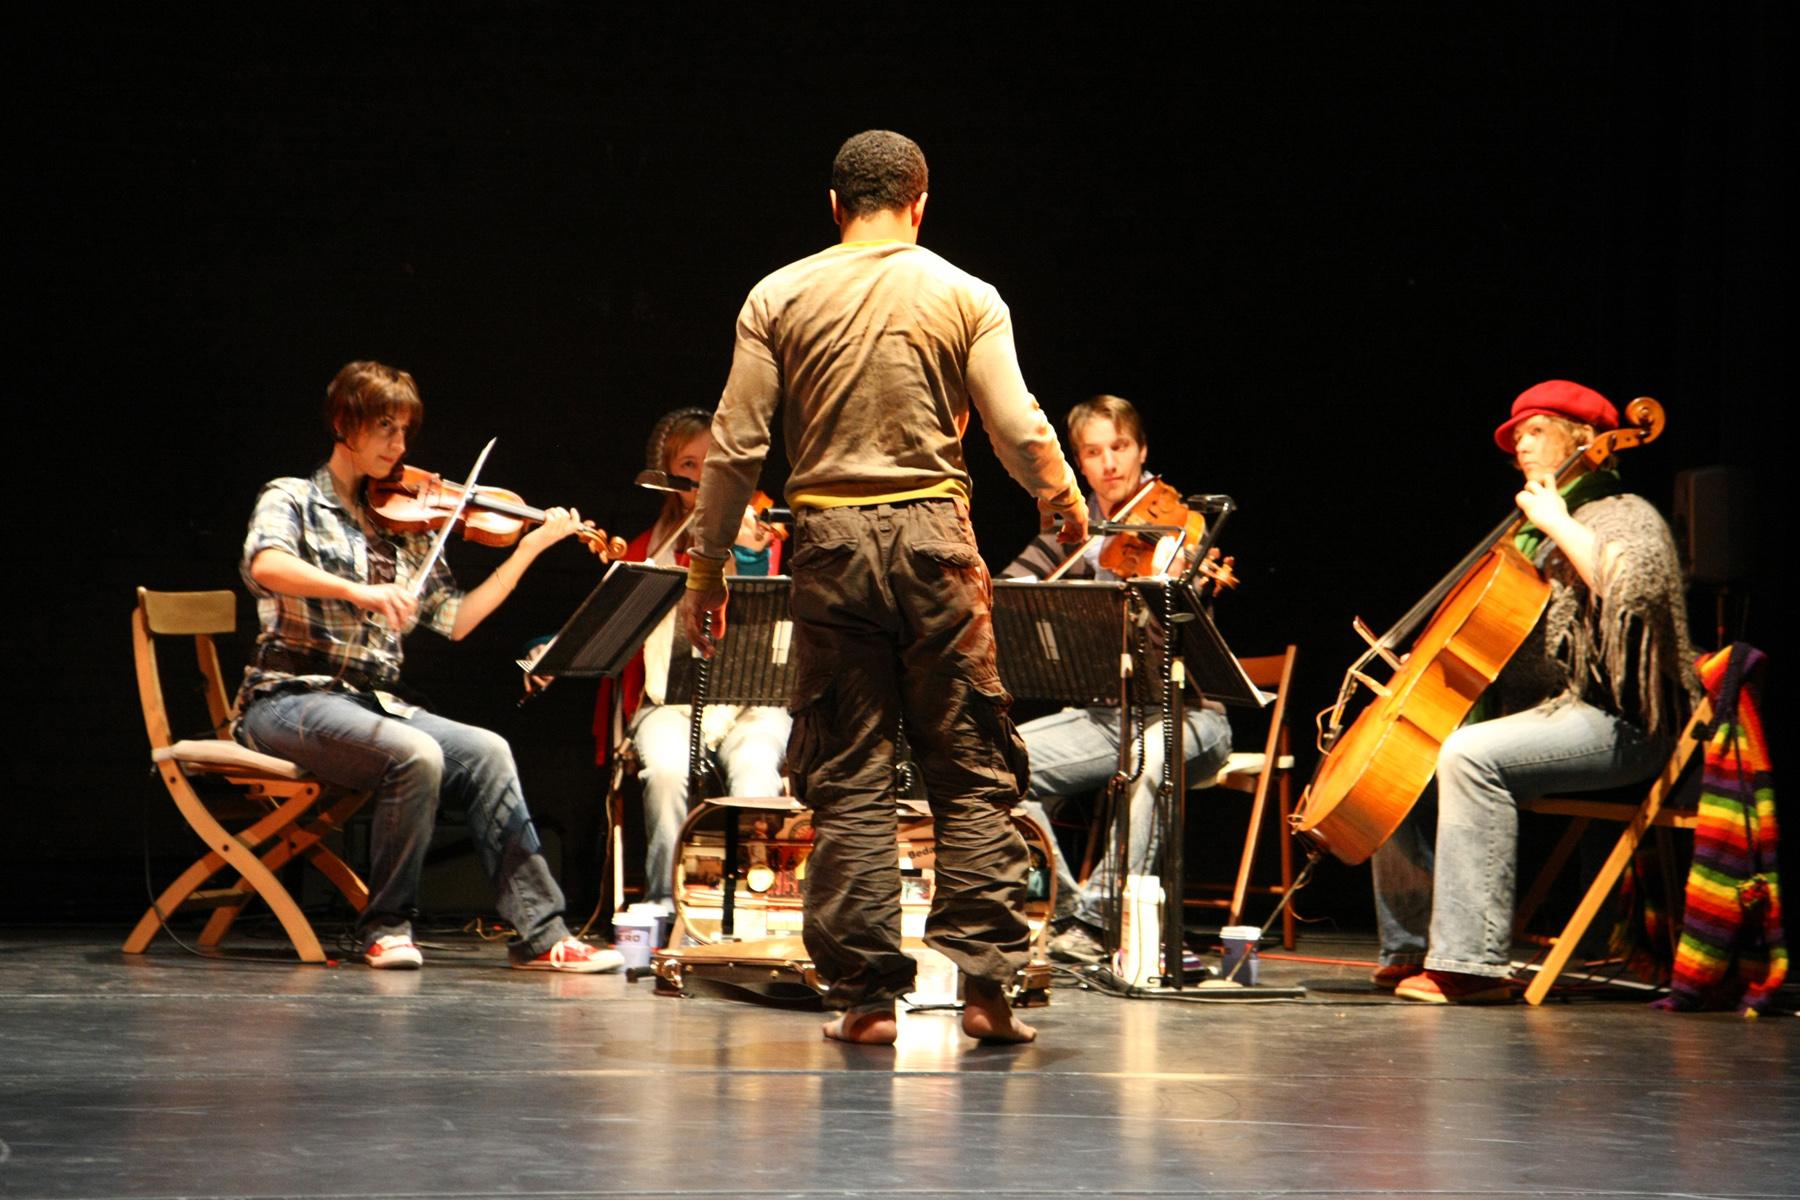 BOBD Jean & string quartet.jpg